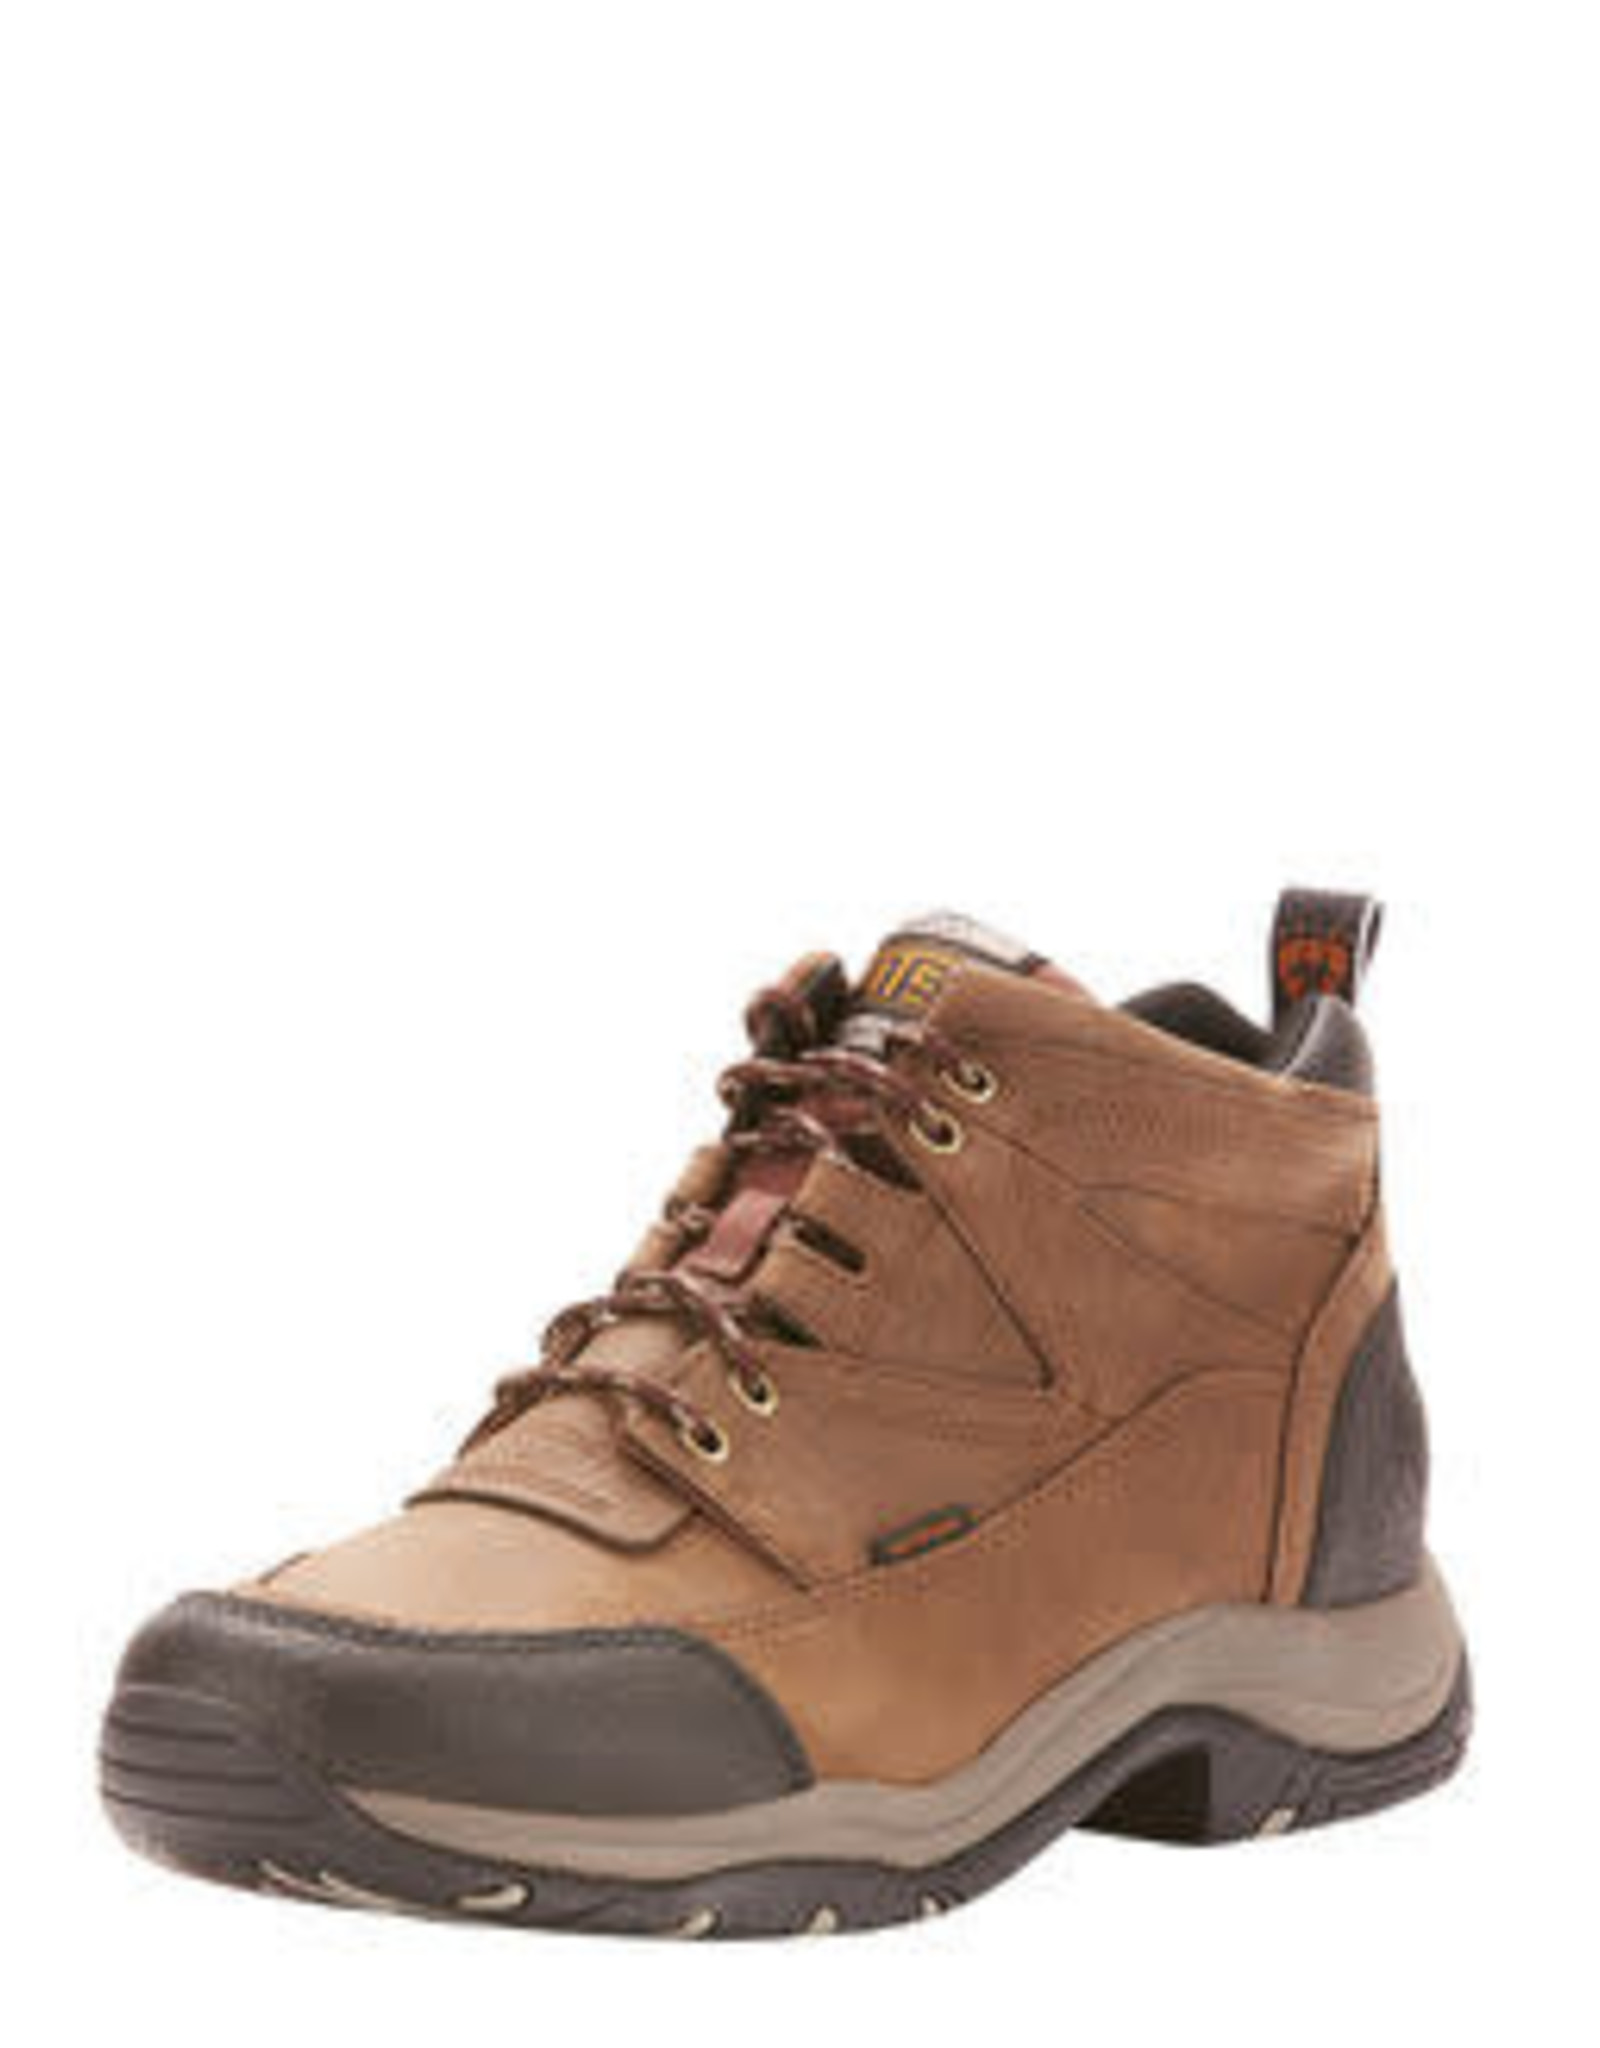 Ariat Boots Ariat Terrain H2O